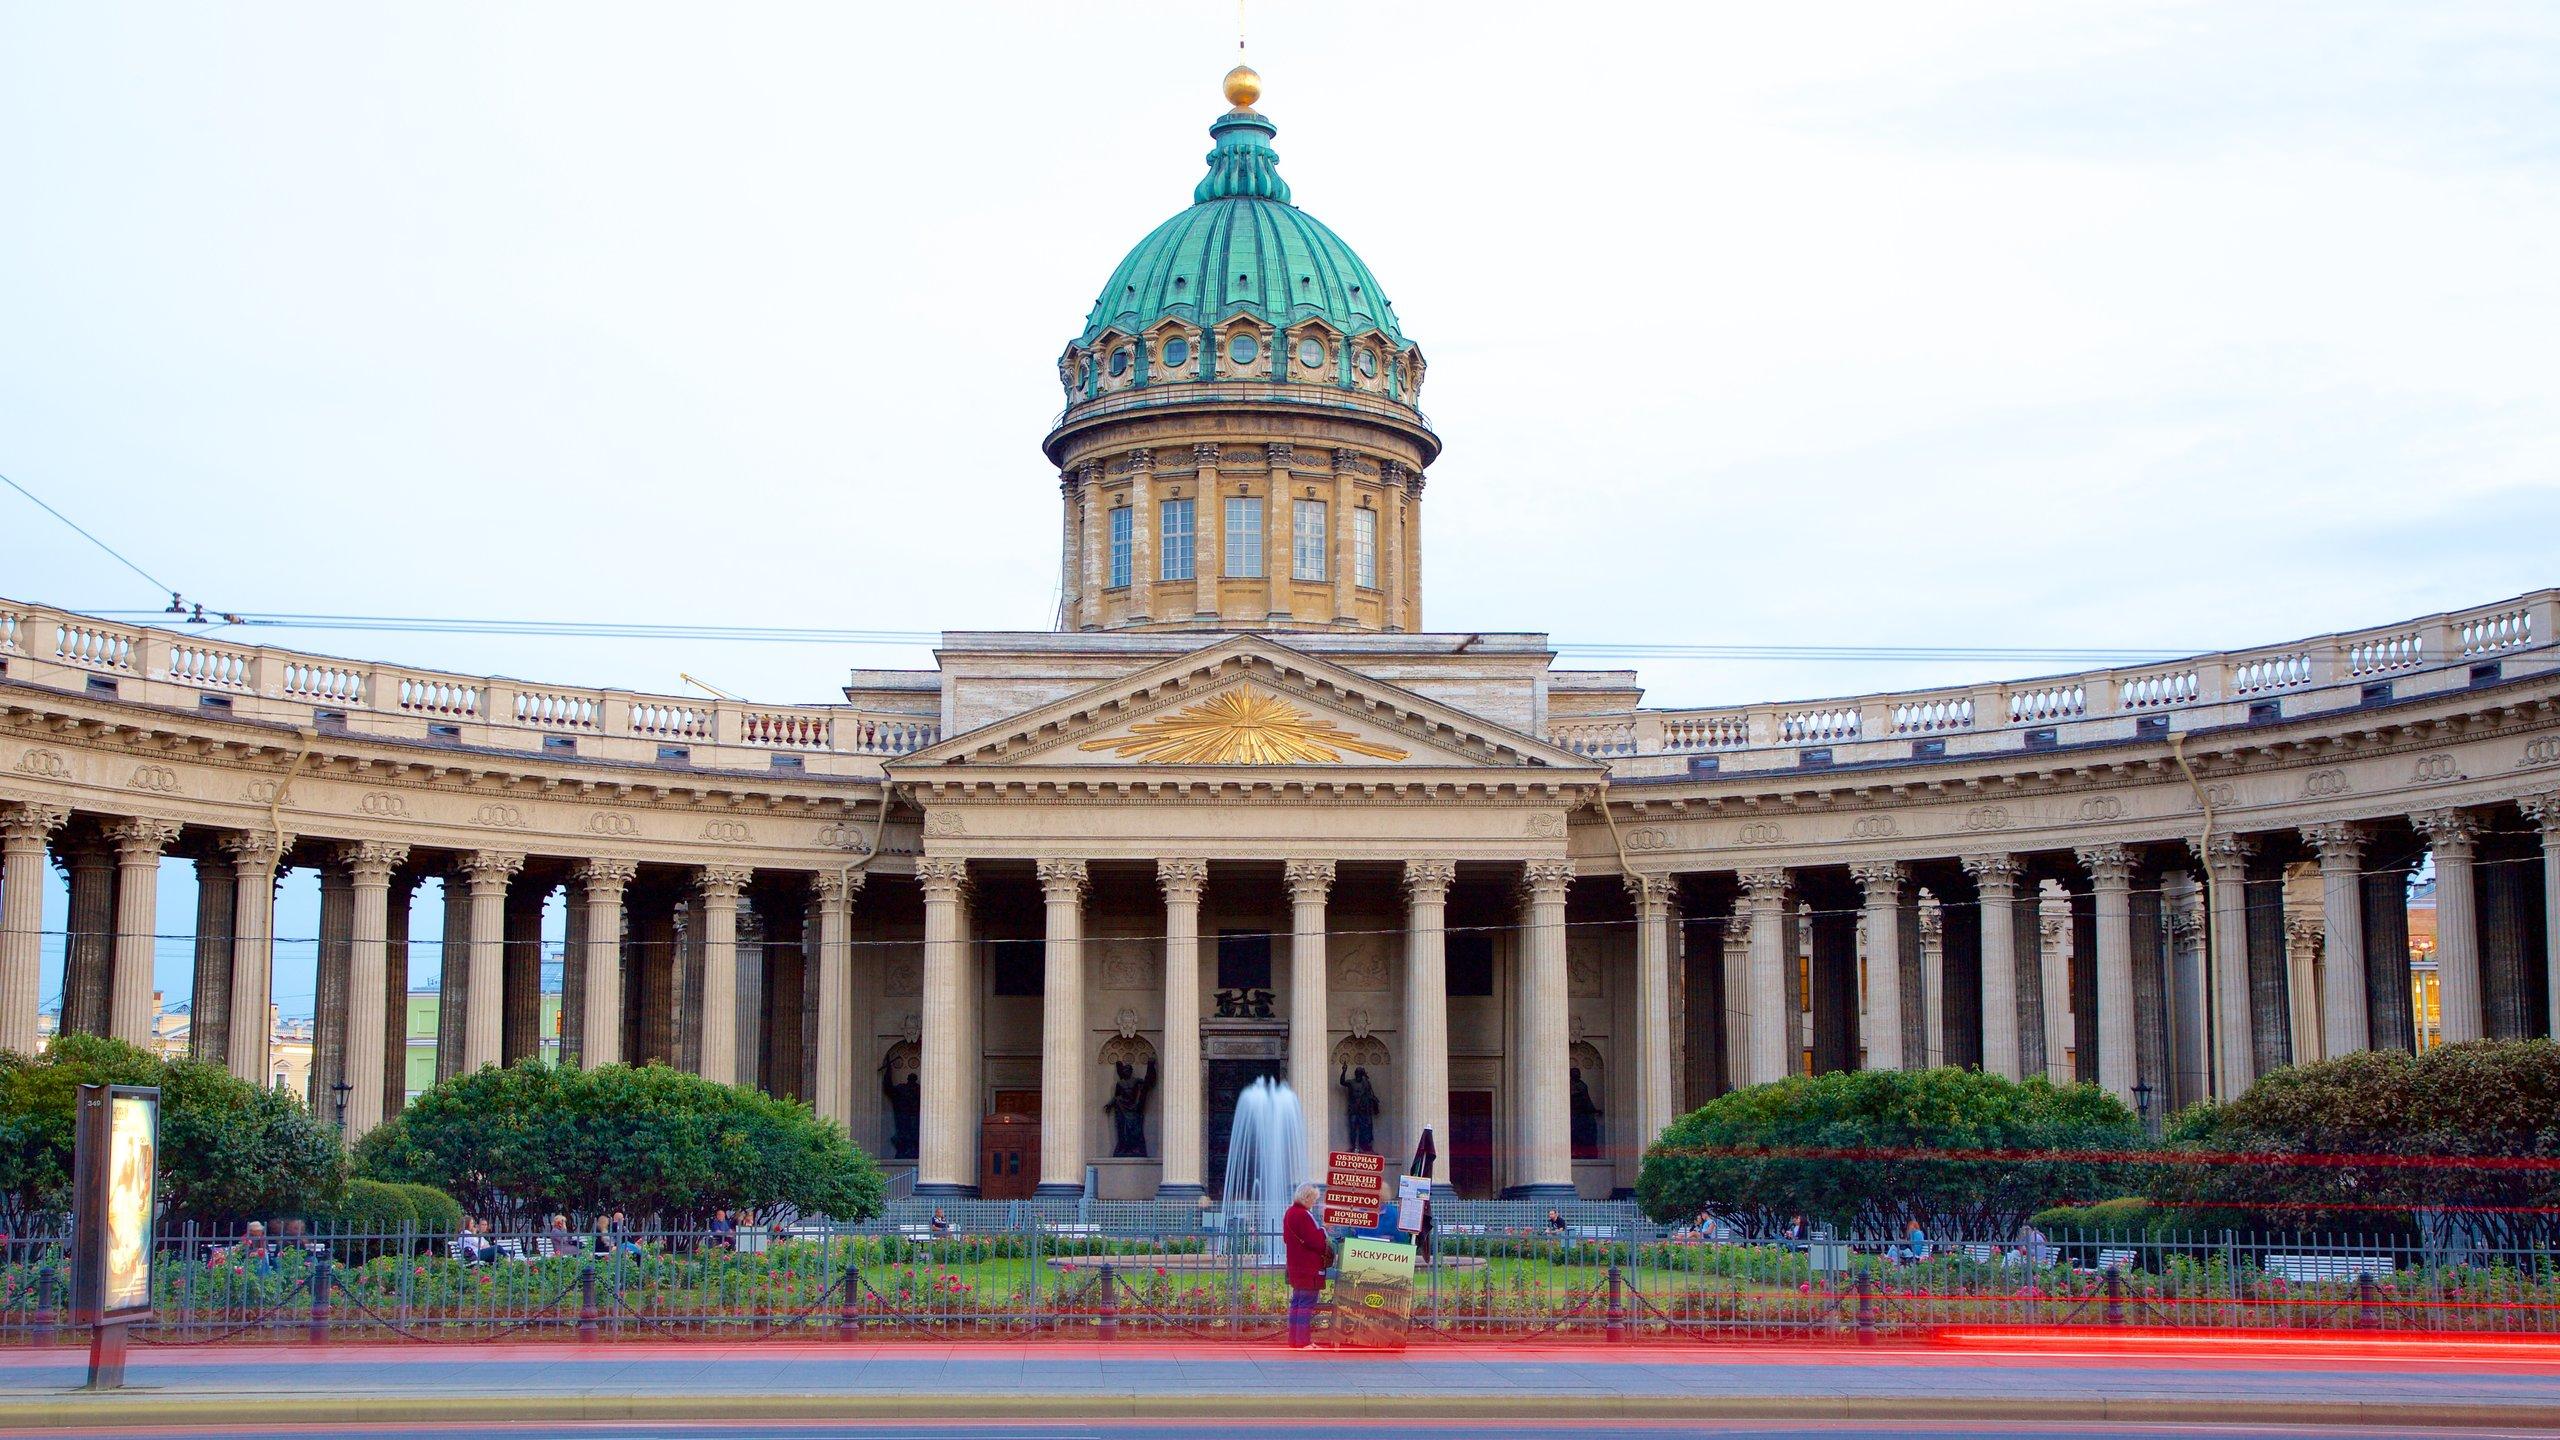 District No. 78, St. Petersburg, Saint Petersburg, Russia